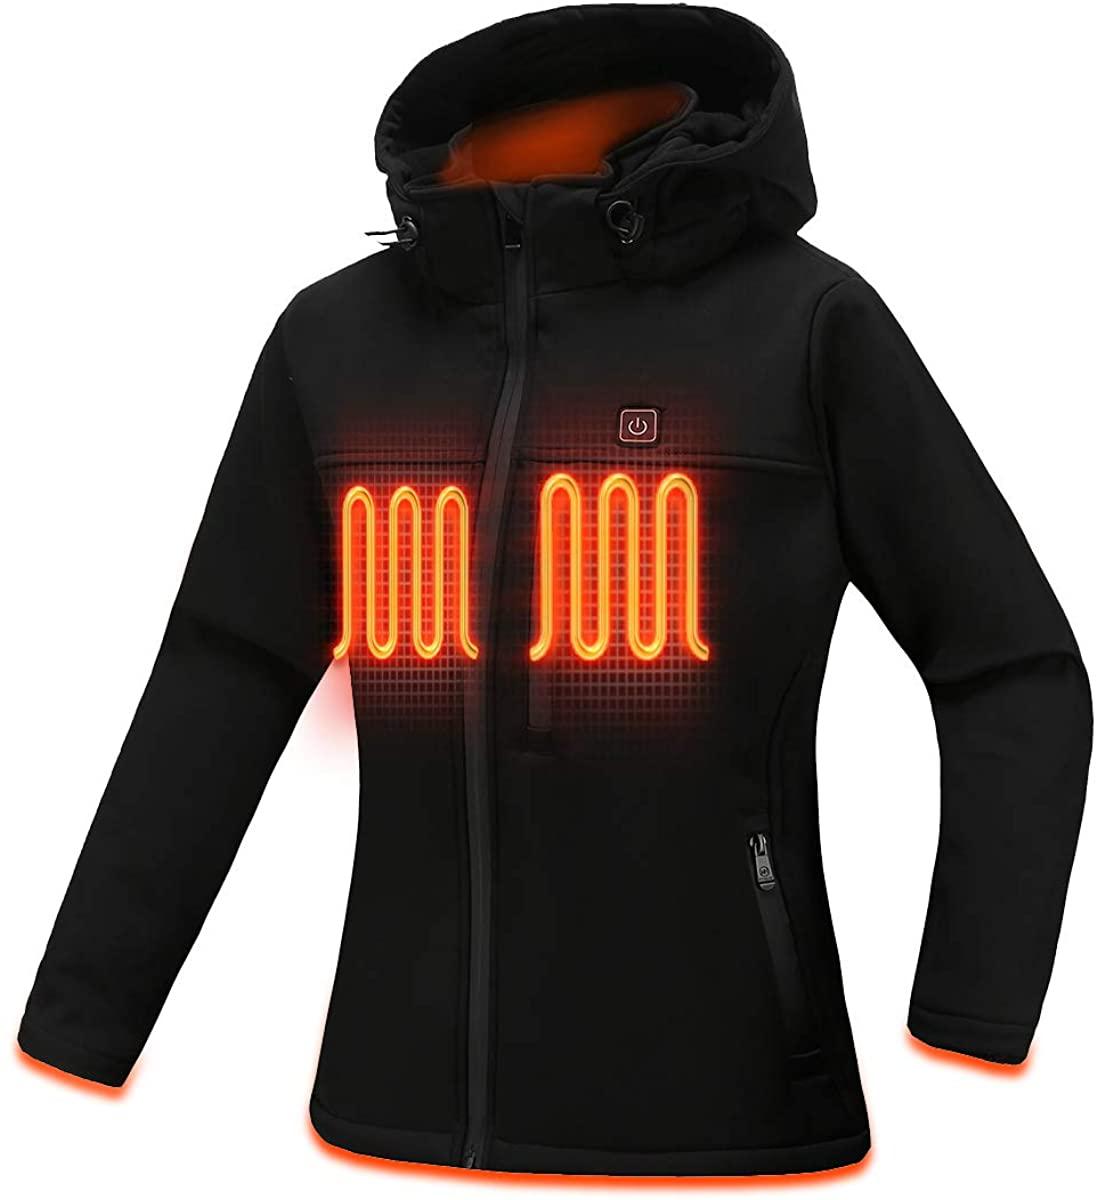 MYHEAT Women's Heated Jacket Soft Shell Eletric Heated Jacket with Detachable Hood and Battery Pack Black